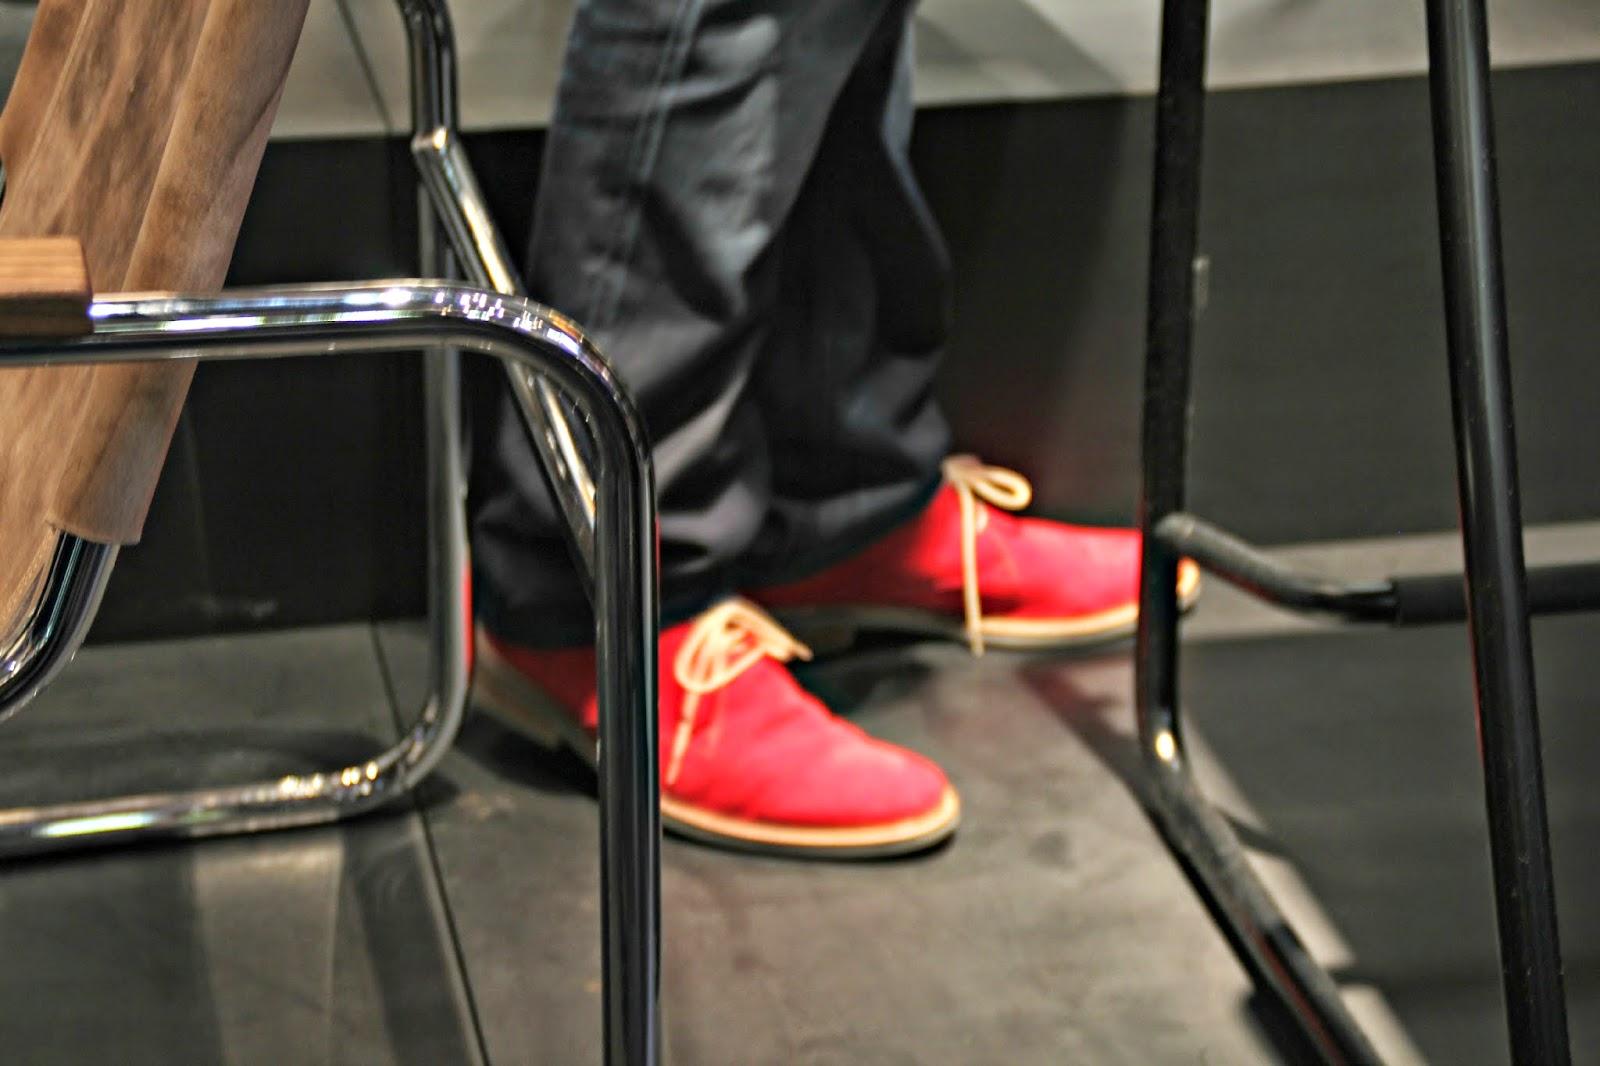 Rote Schuhe ,Thonet imm Köln ,Wiener Kaffeehausstuhl, Bopparder Schichtstuhl, Holz biegen ,Bugholz